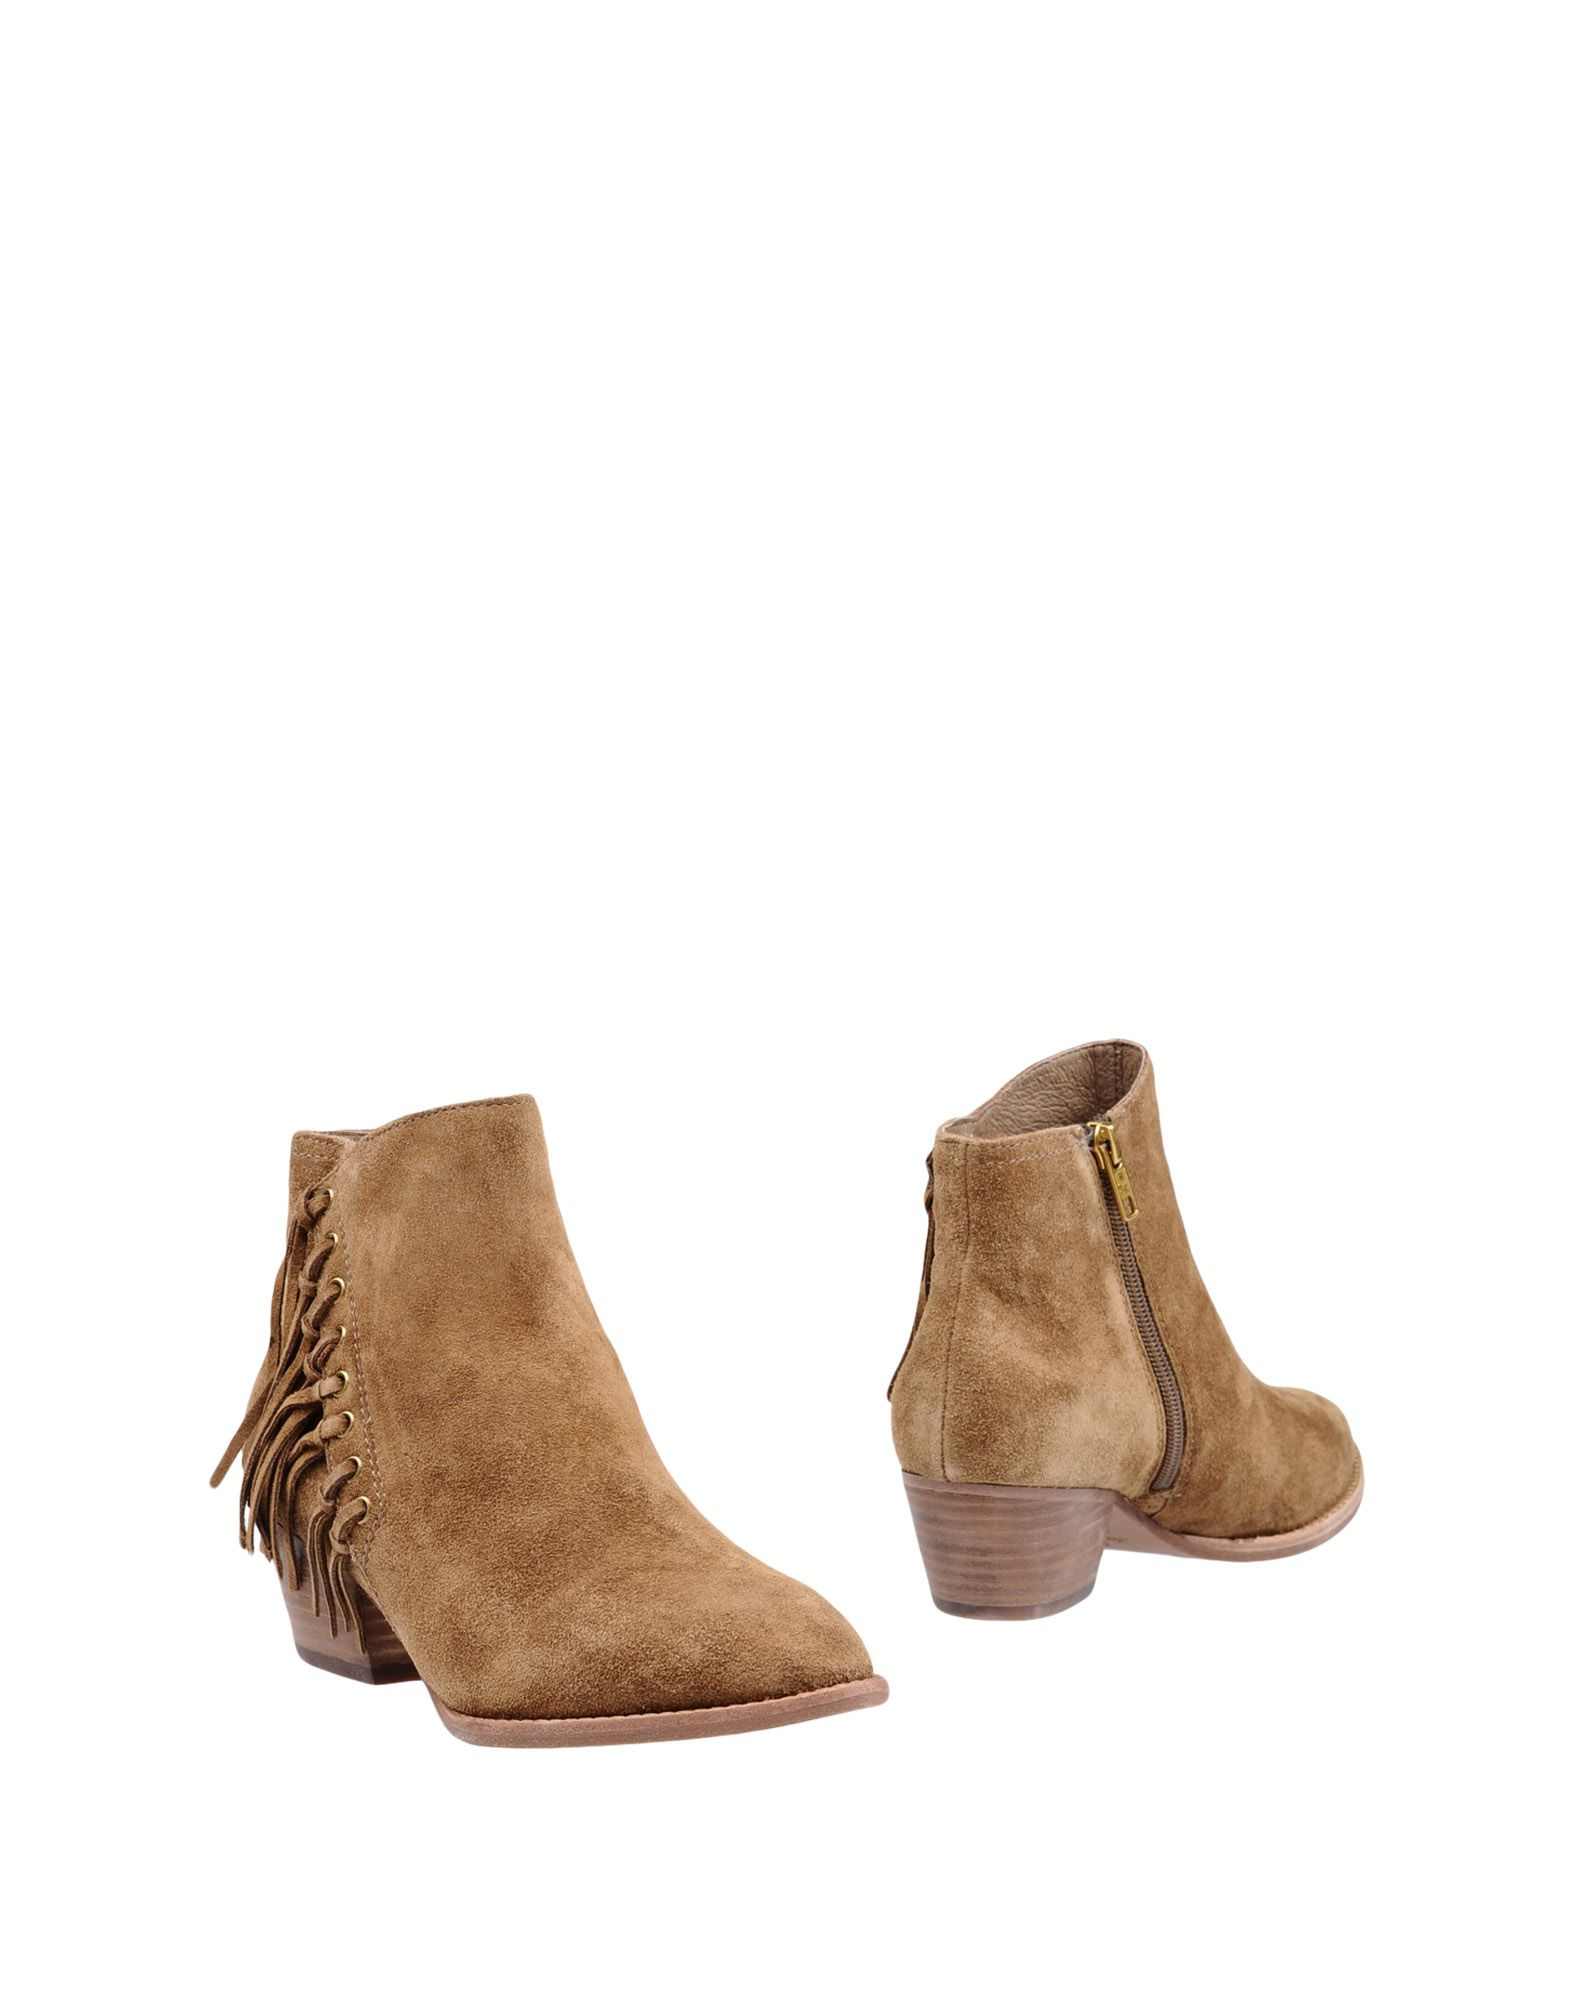 Stilvolle billige Schuhe Damen Ash Stiefelette Damen Schuhe  11248281DF 64738f